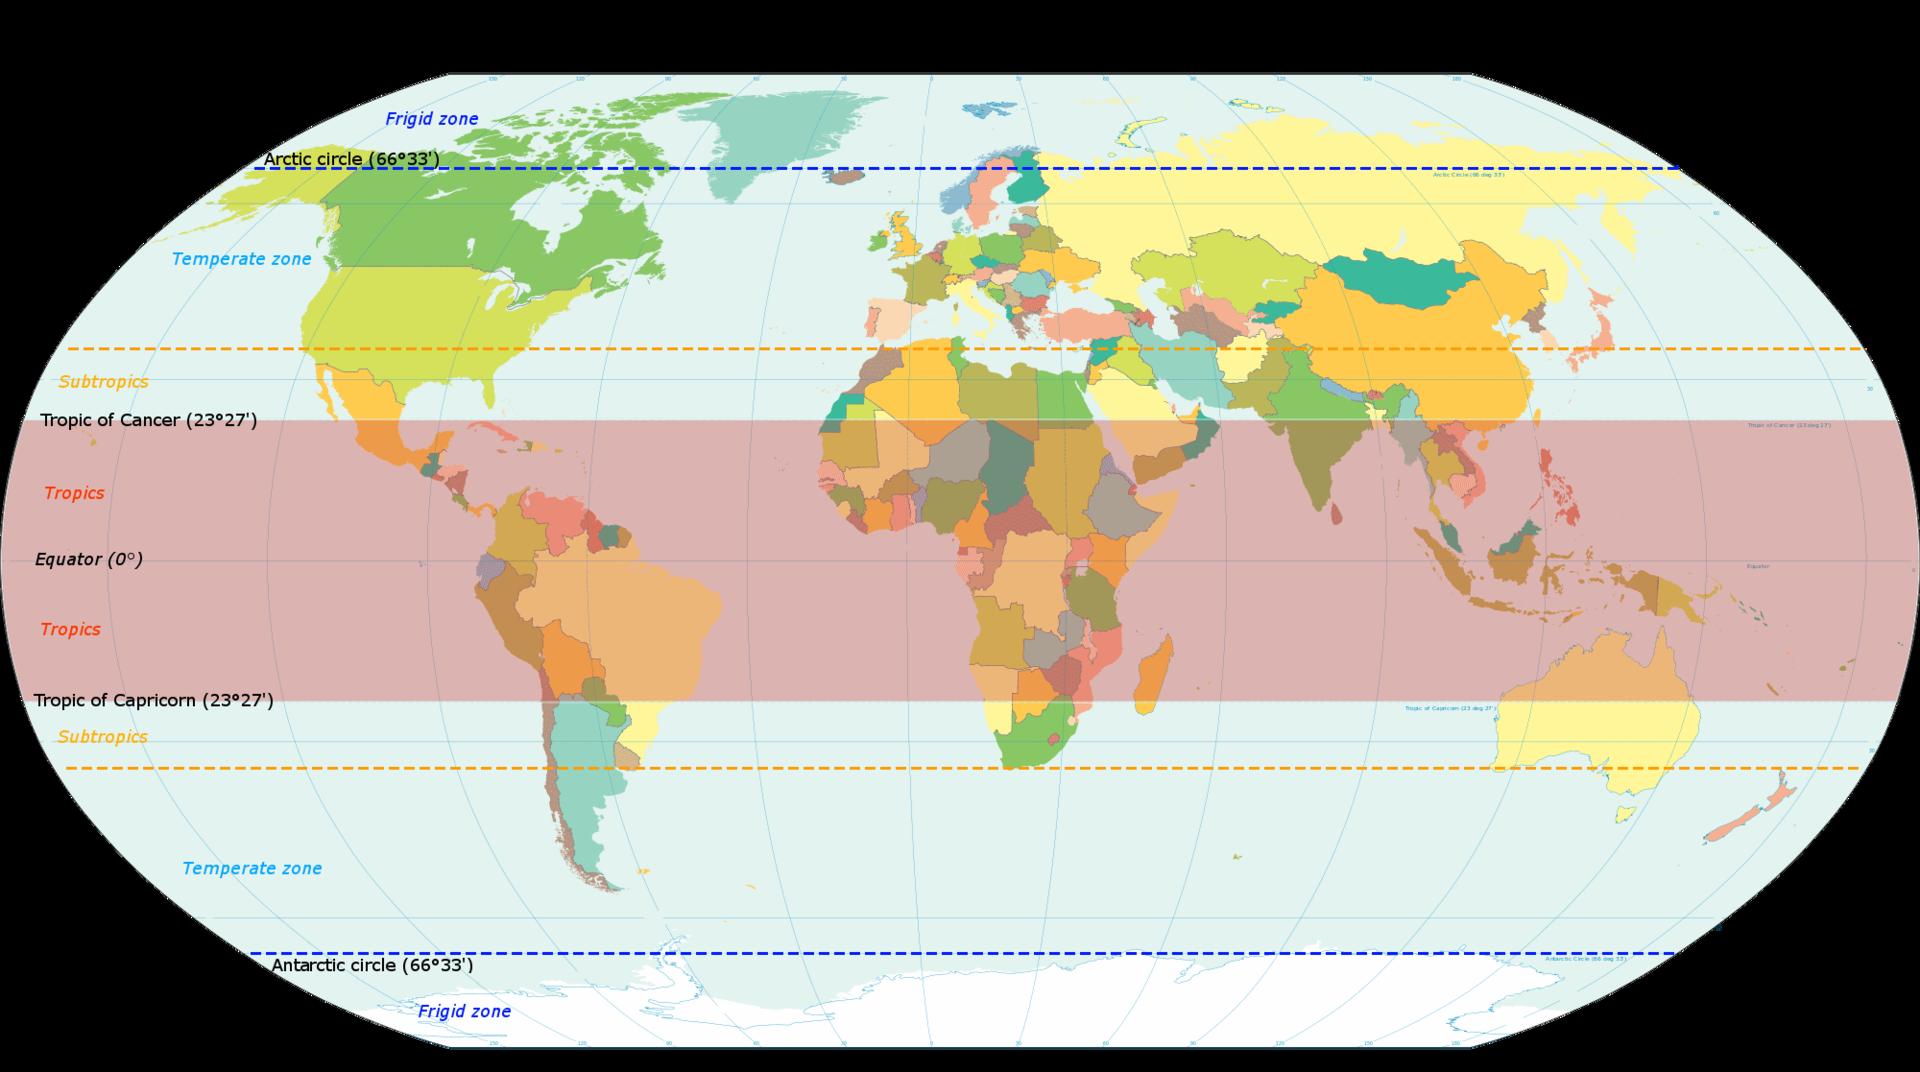 World Map Indicating Tropics And Subtropics